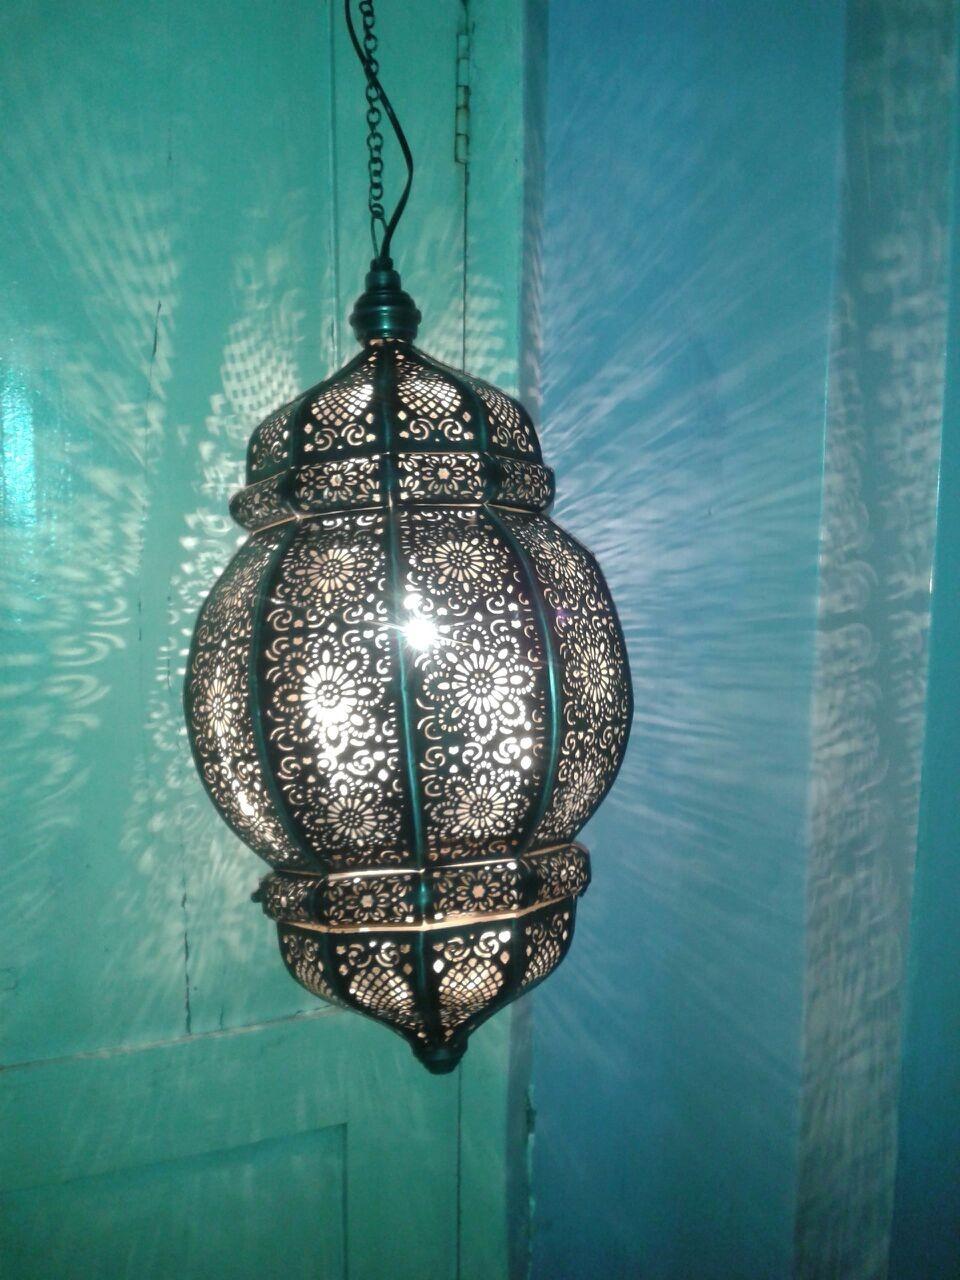 Free-swinging lattice lantern cage